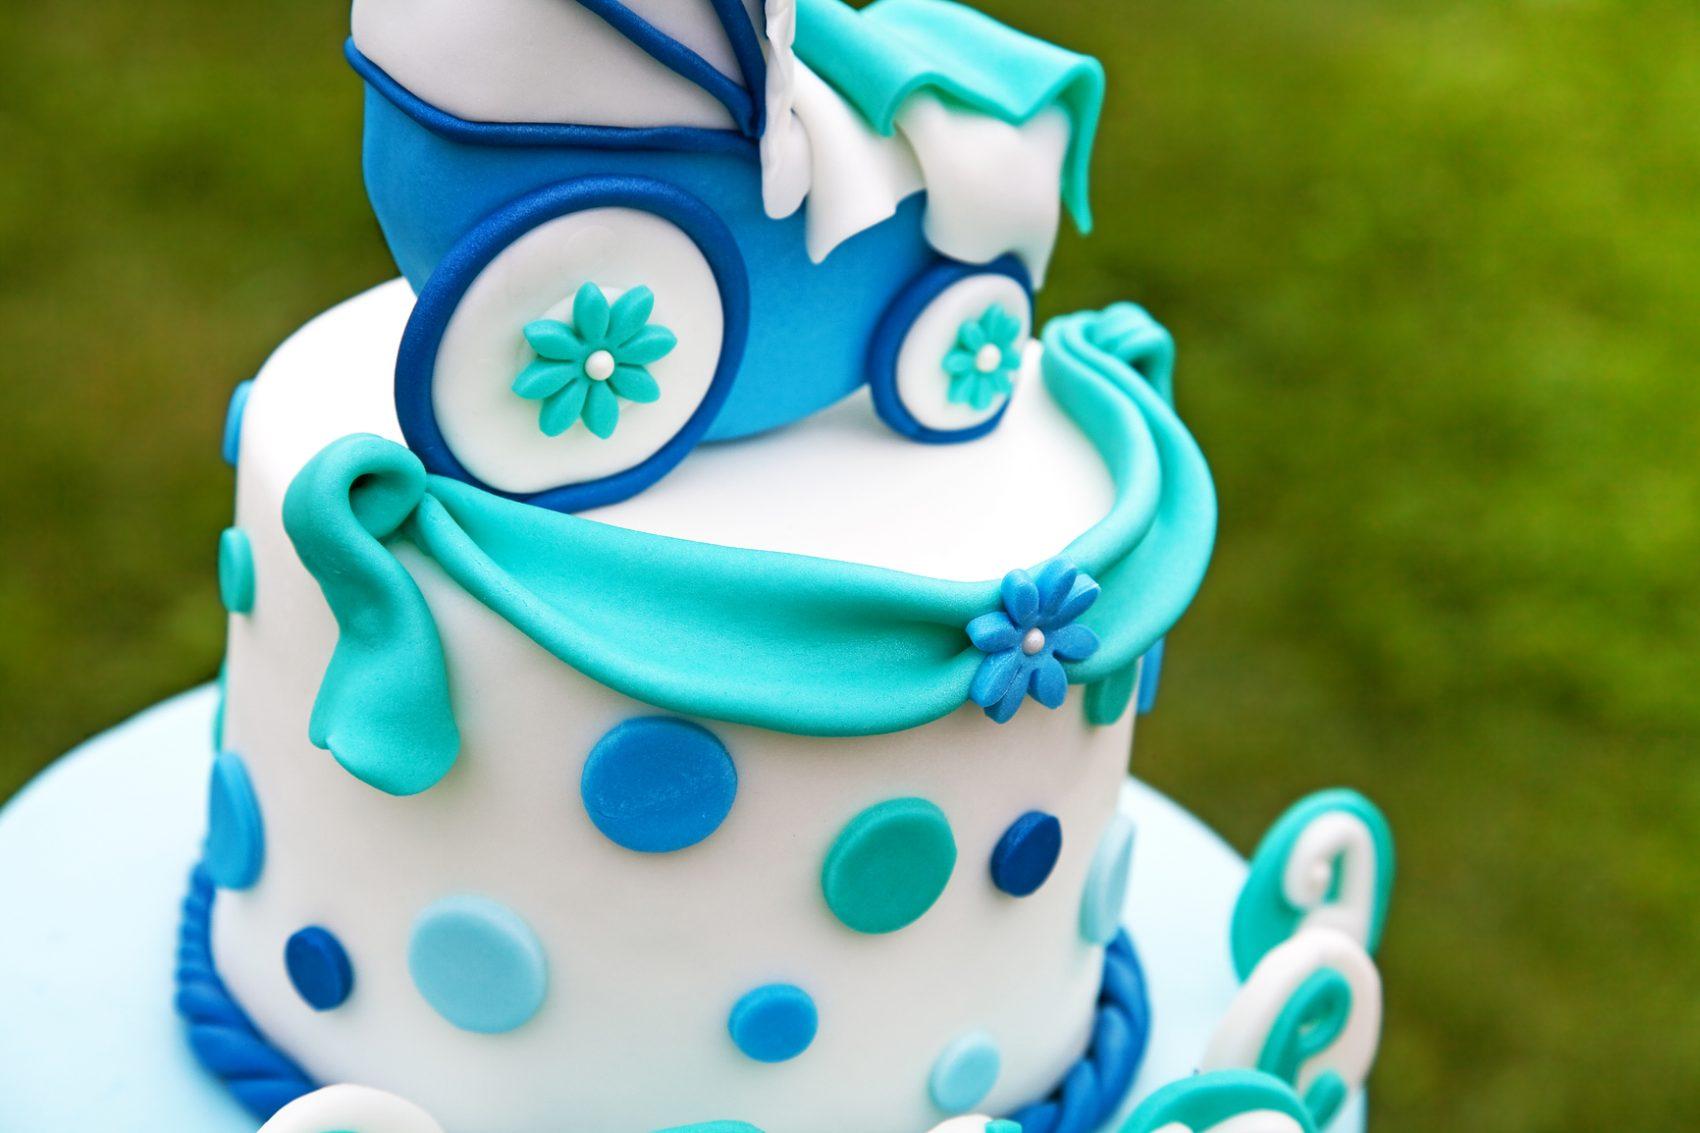 Torte decorate per battesimo carrozzina